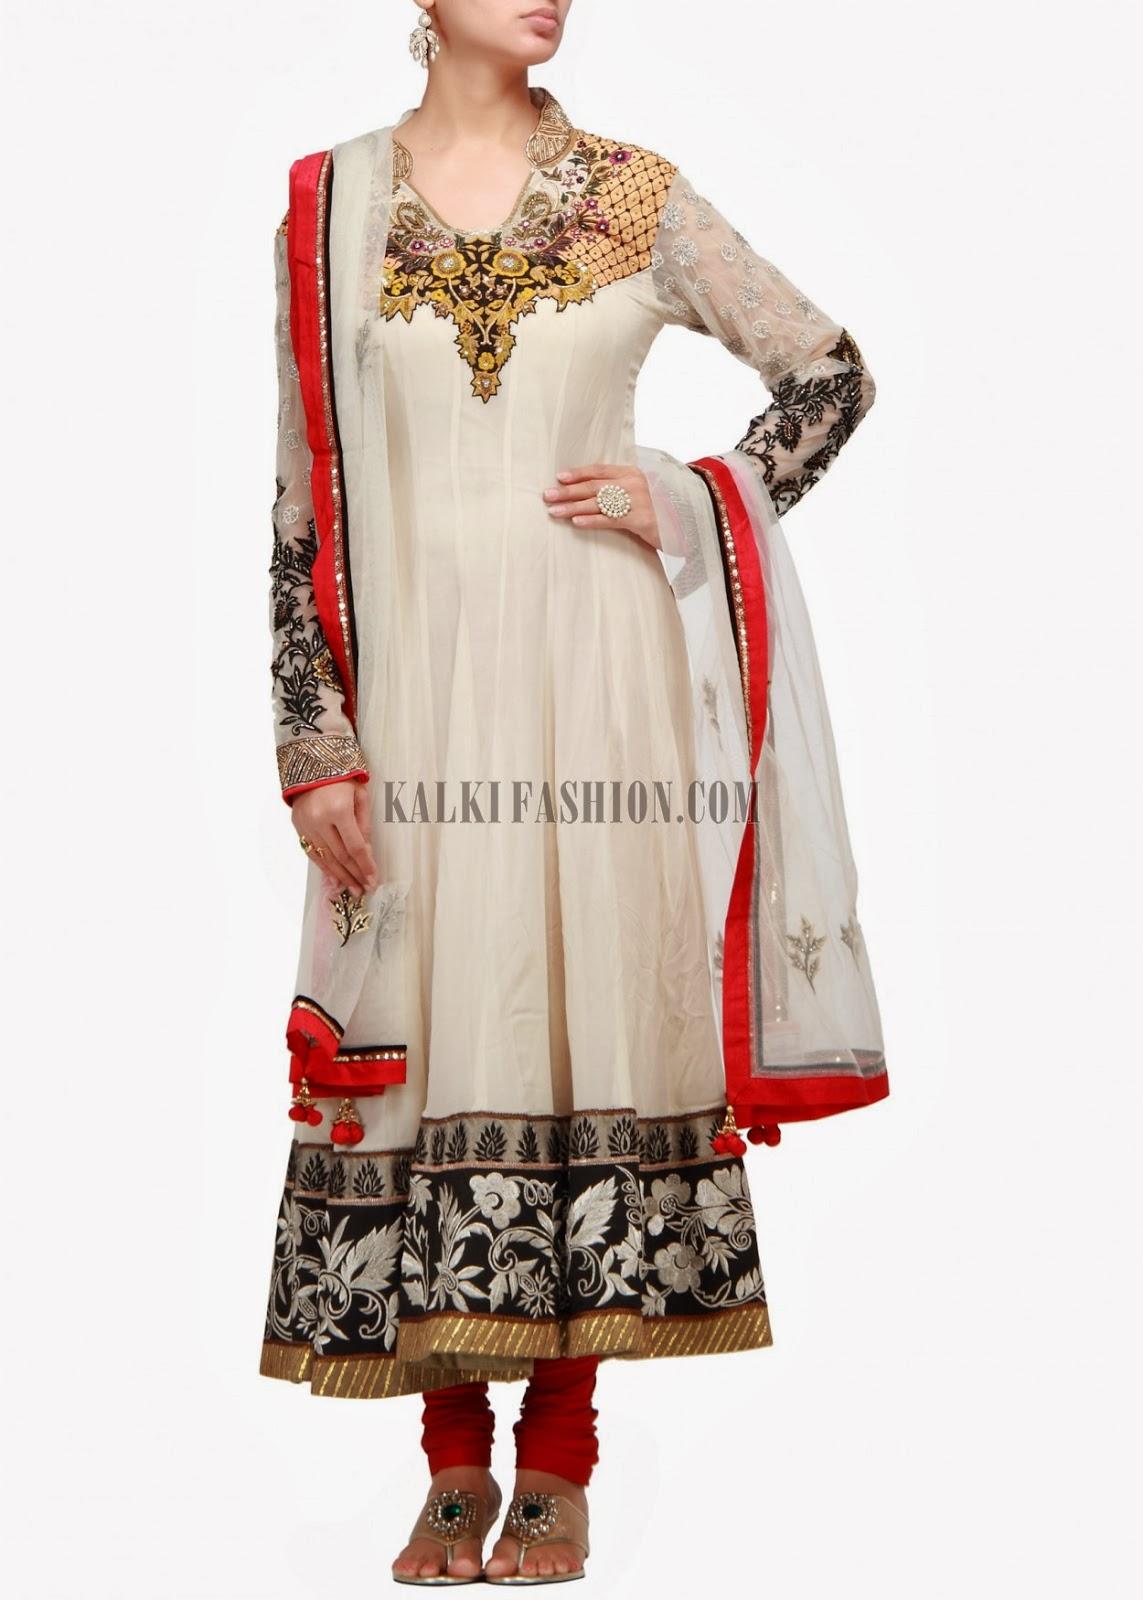 Hairstyles For Short Hair On Salwar Suits : ... Designs Churidar Anarkali Designs Black Anarkali LONG HAIRSTYLES